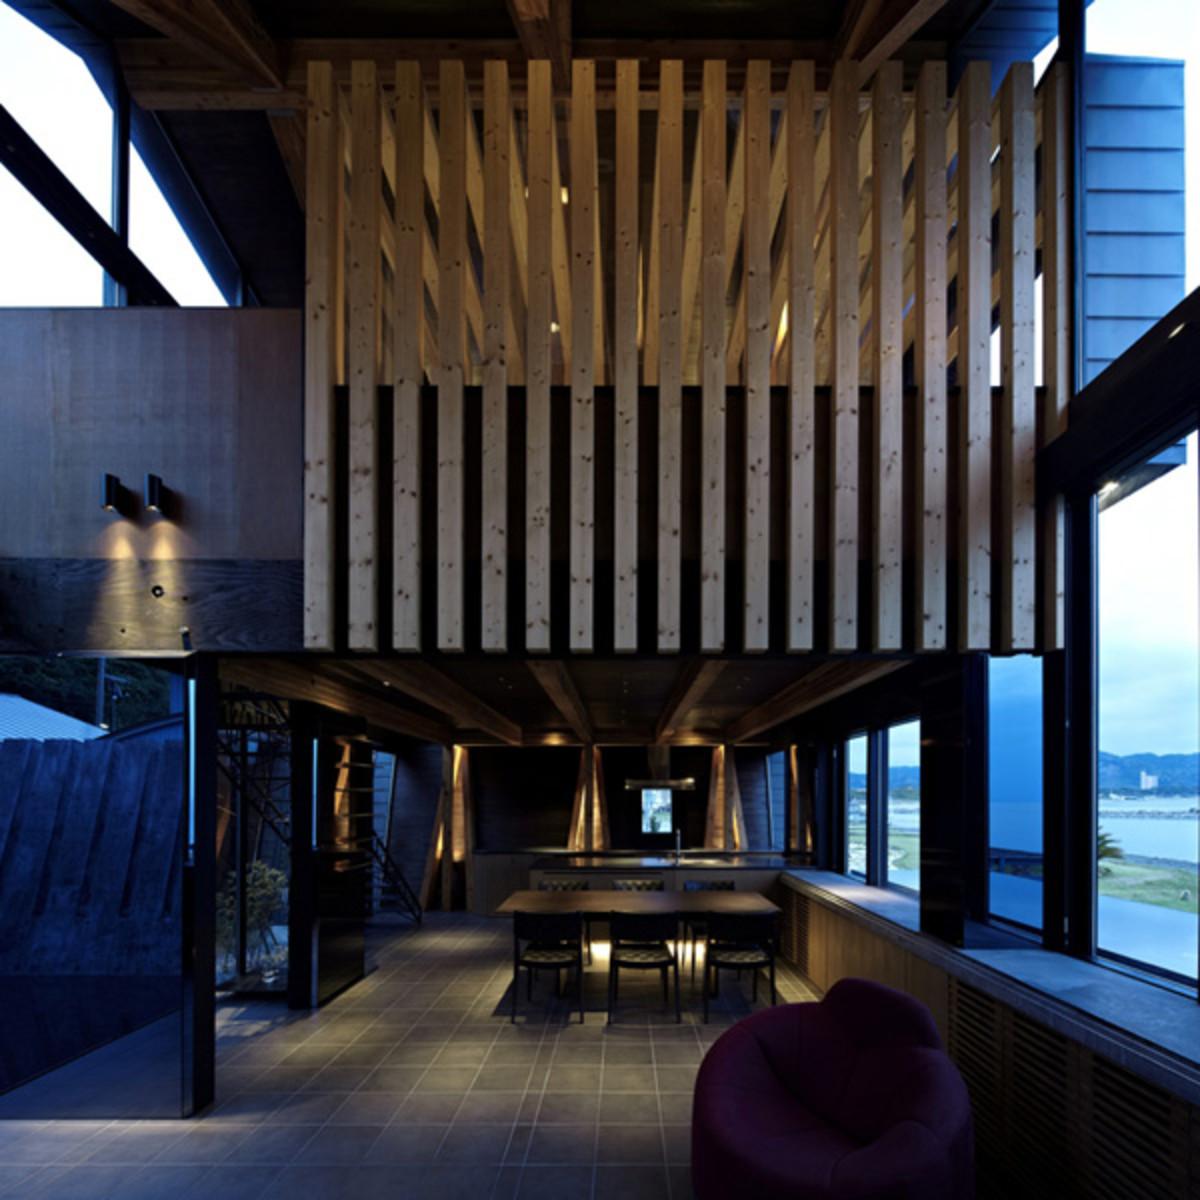 Villa-SSK-by-Takeshi-Hirobe-Architects-6